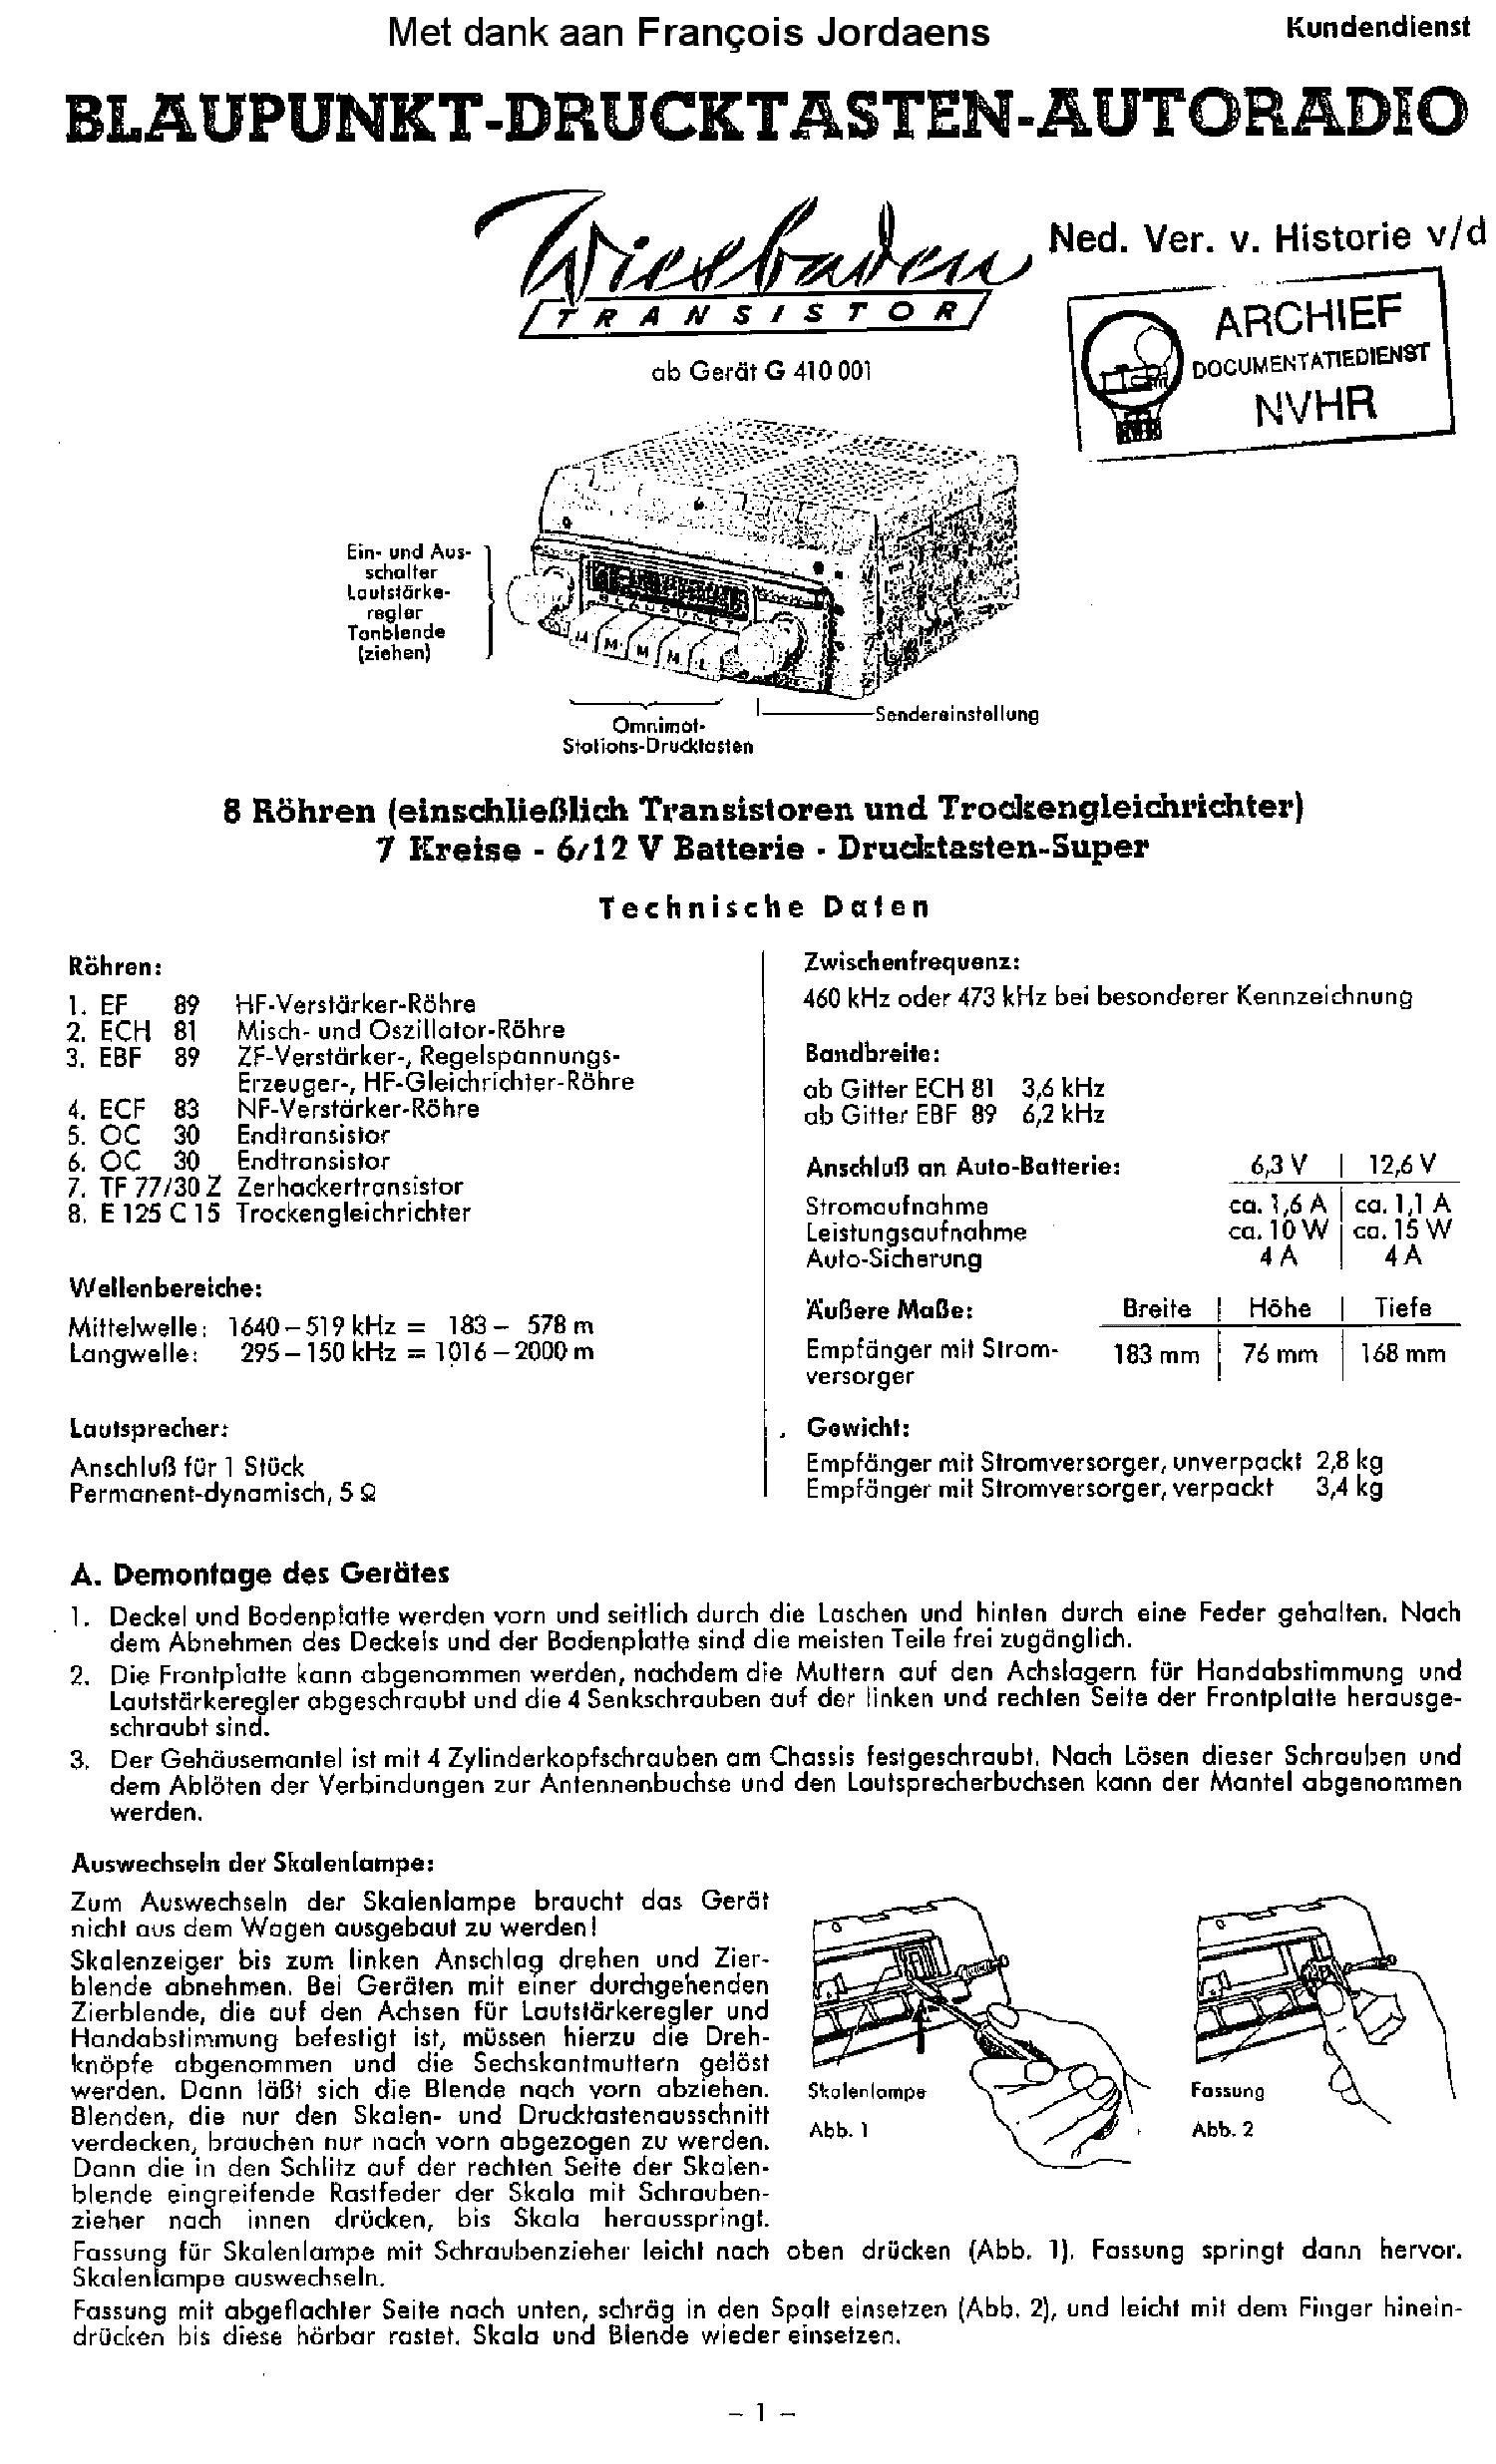 BLAUPUNKT WIESBADEN 6-12V TRANSISTOR AUTORADIO SM Service Manual ...